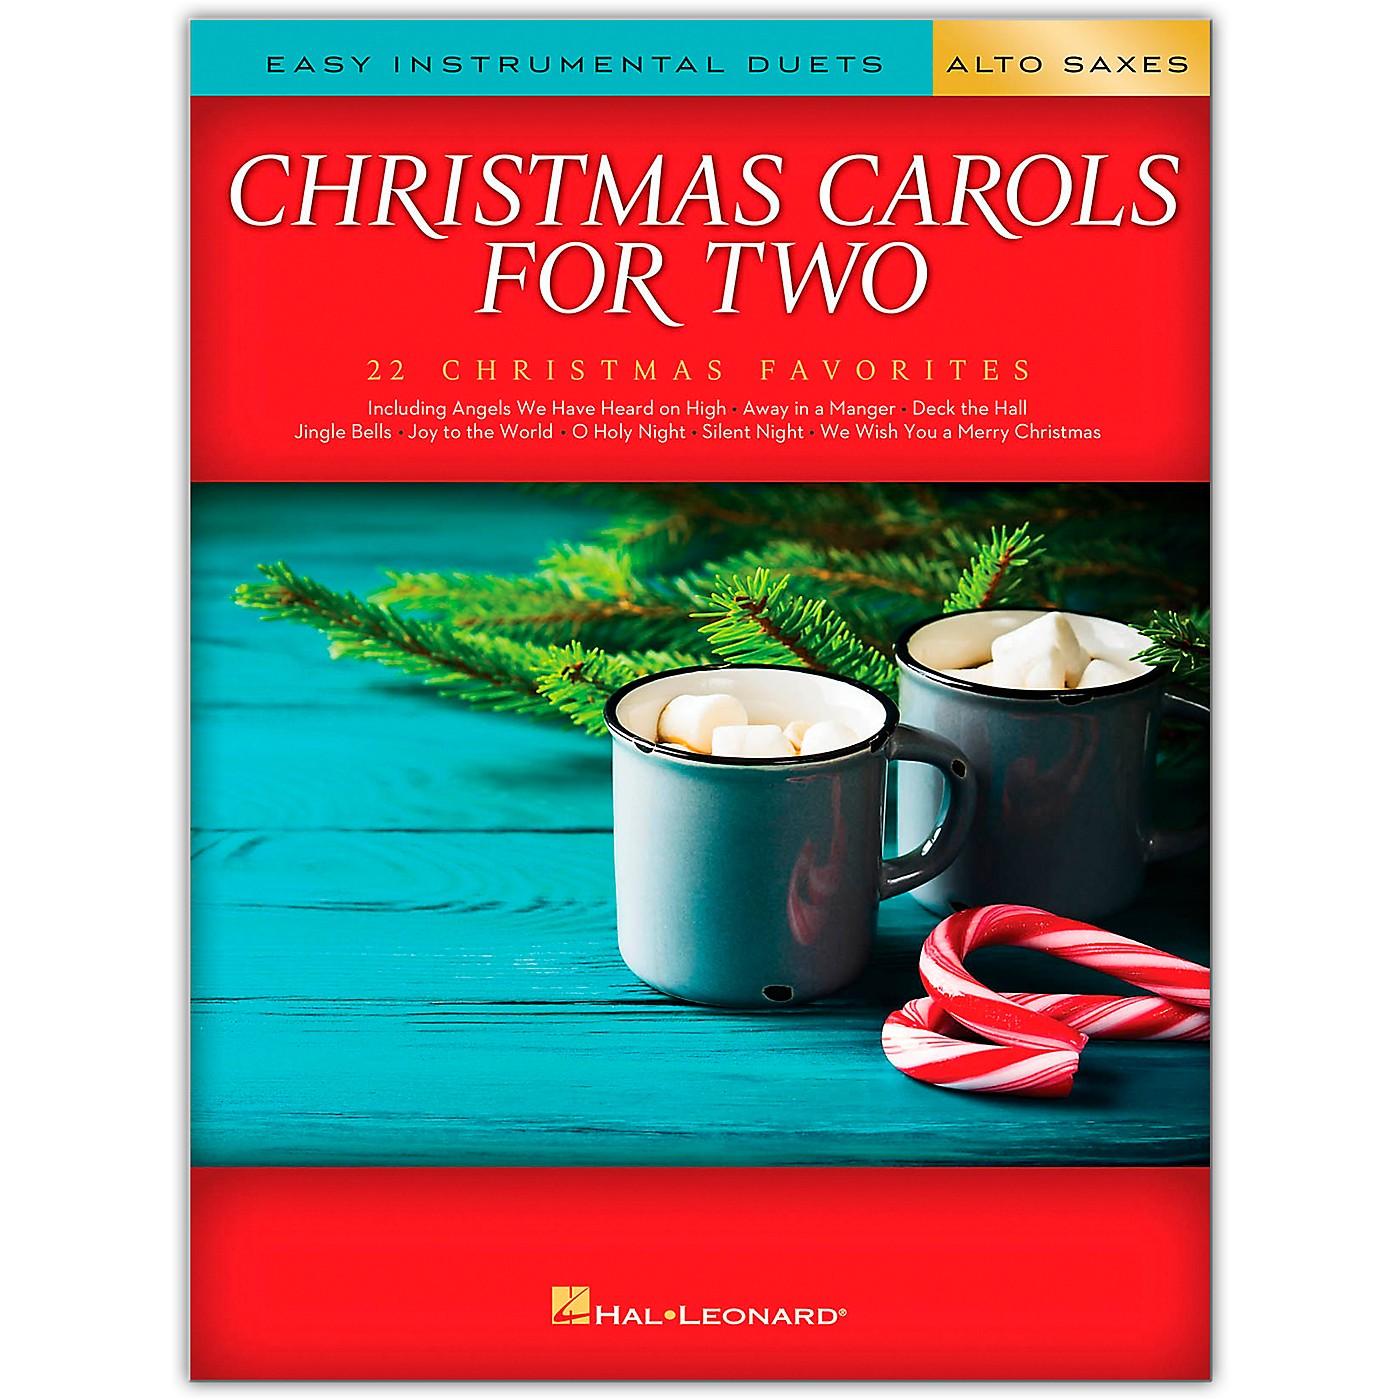 Hal Leonard Christmas Carols for Two Alto Saxes (Easy Instrumental Duets) Songbook thumbnail